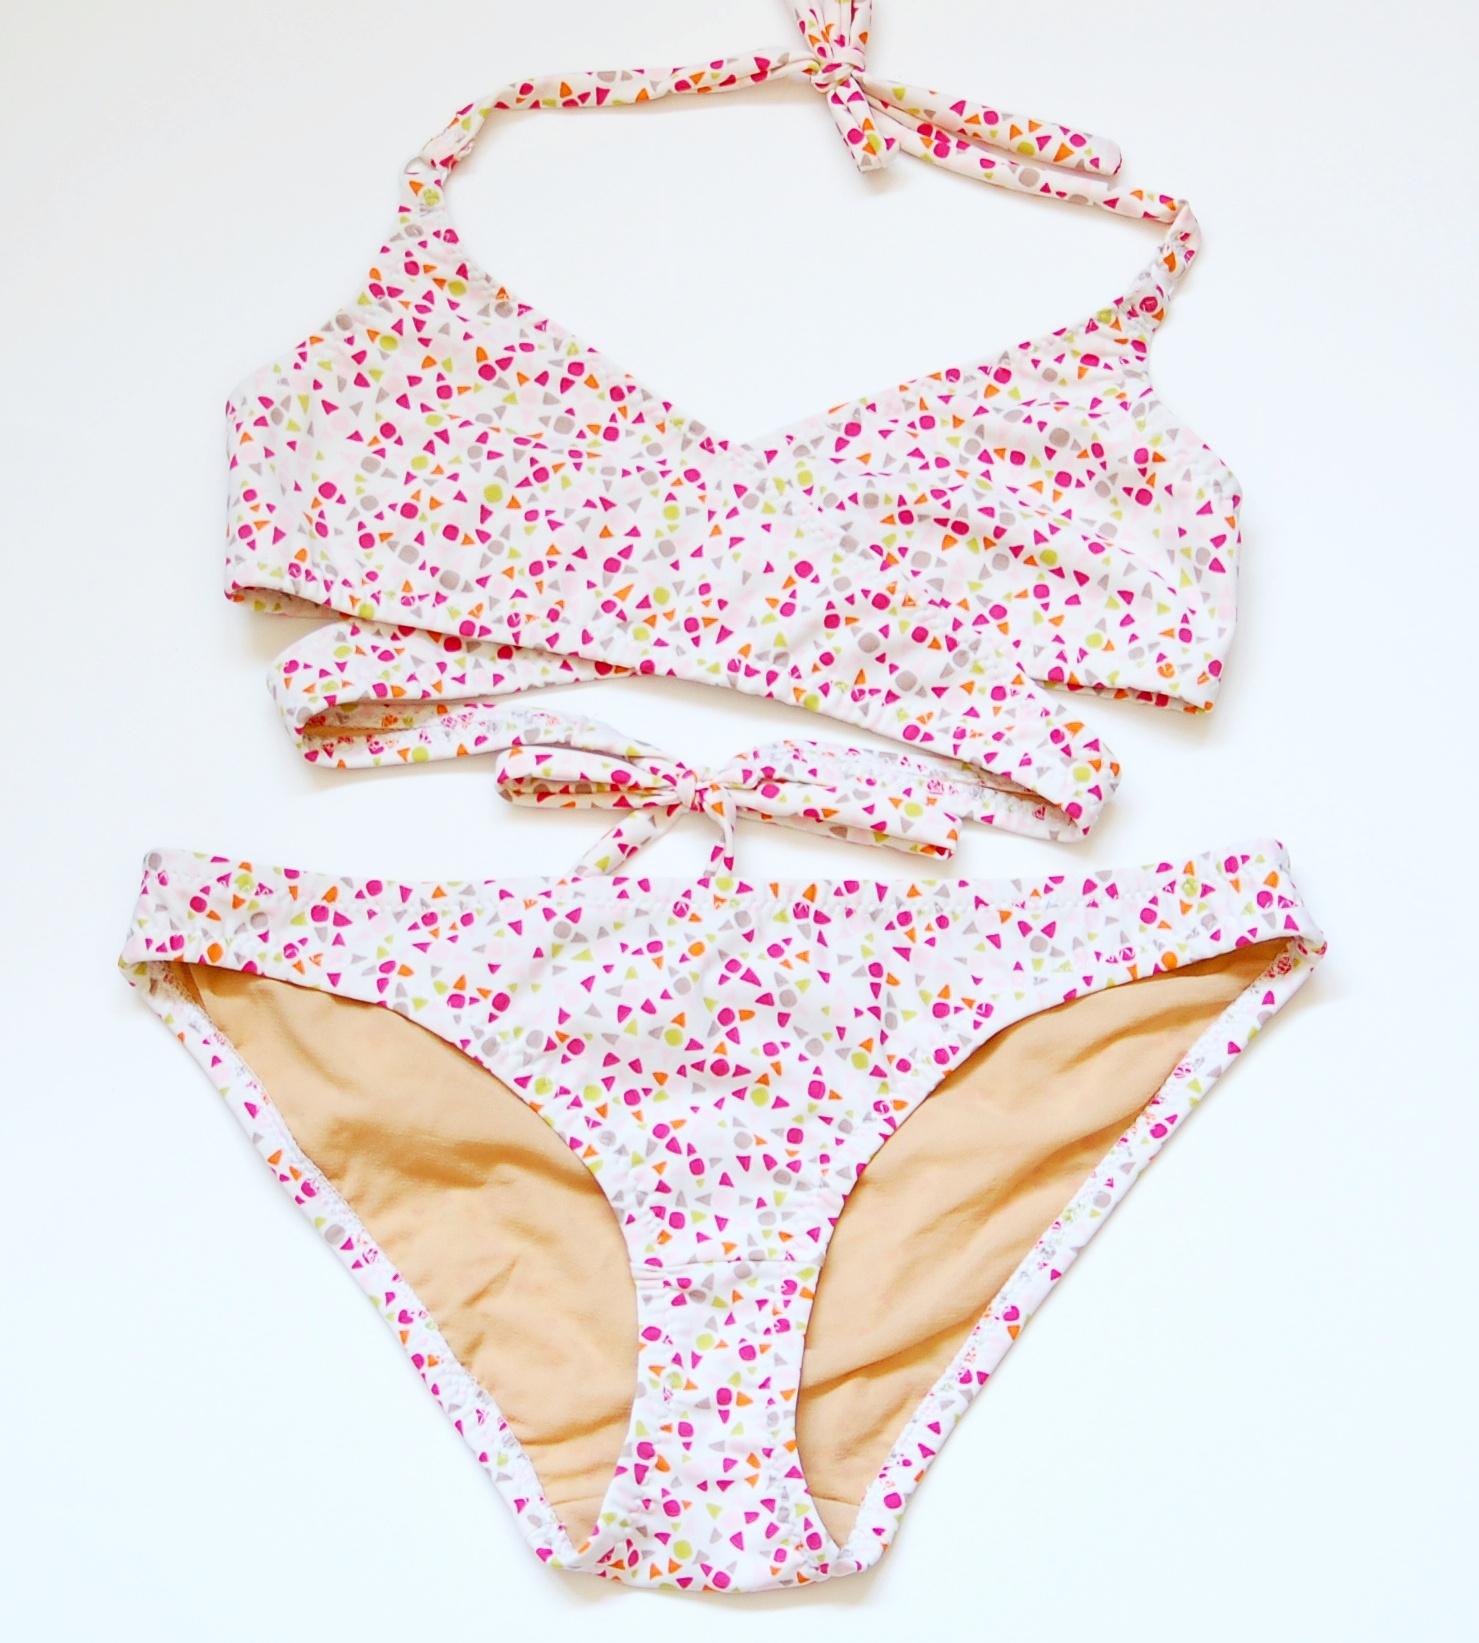 lingerie www.studiocostura.com